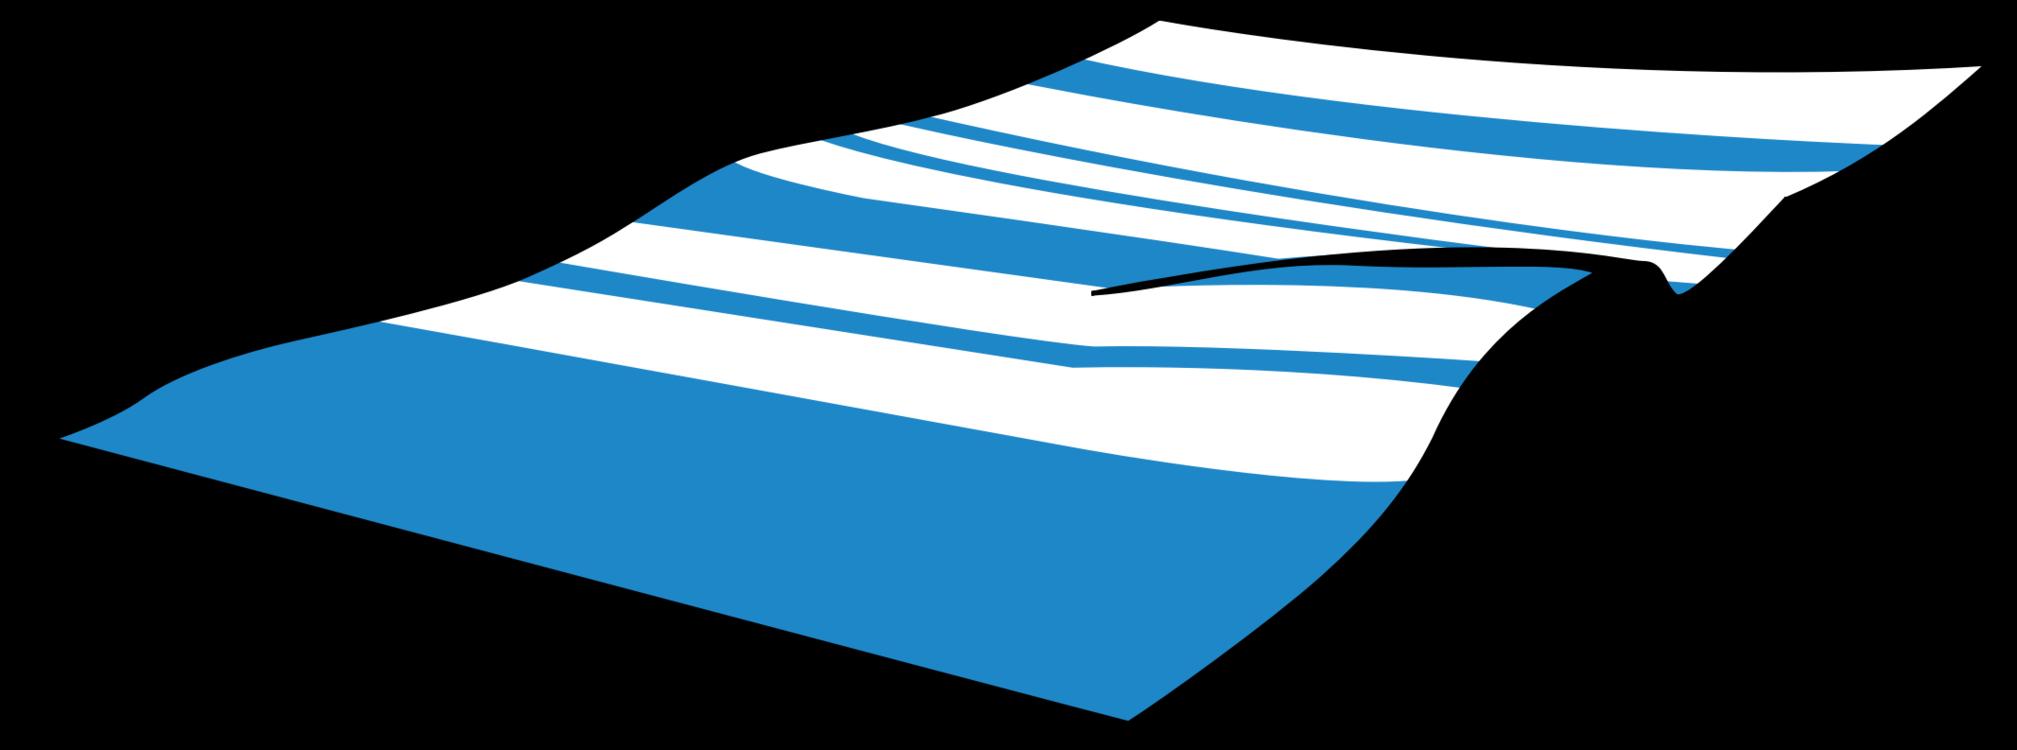 banner royalty free library Bikini vector beach towel. Blanket swimming pools free